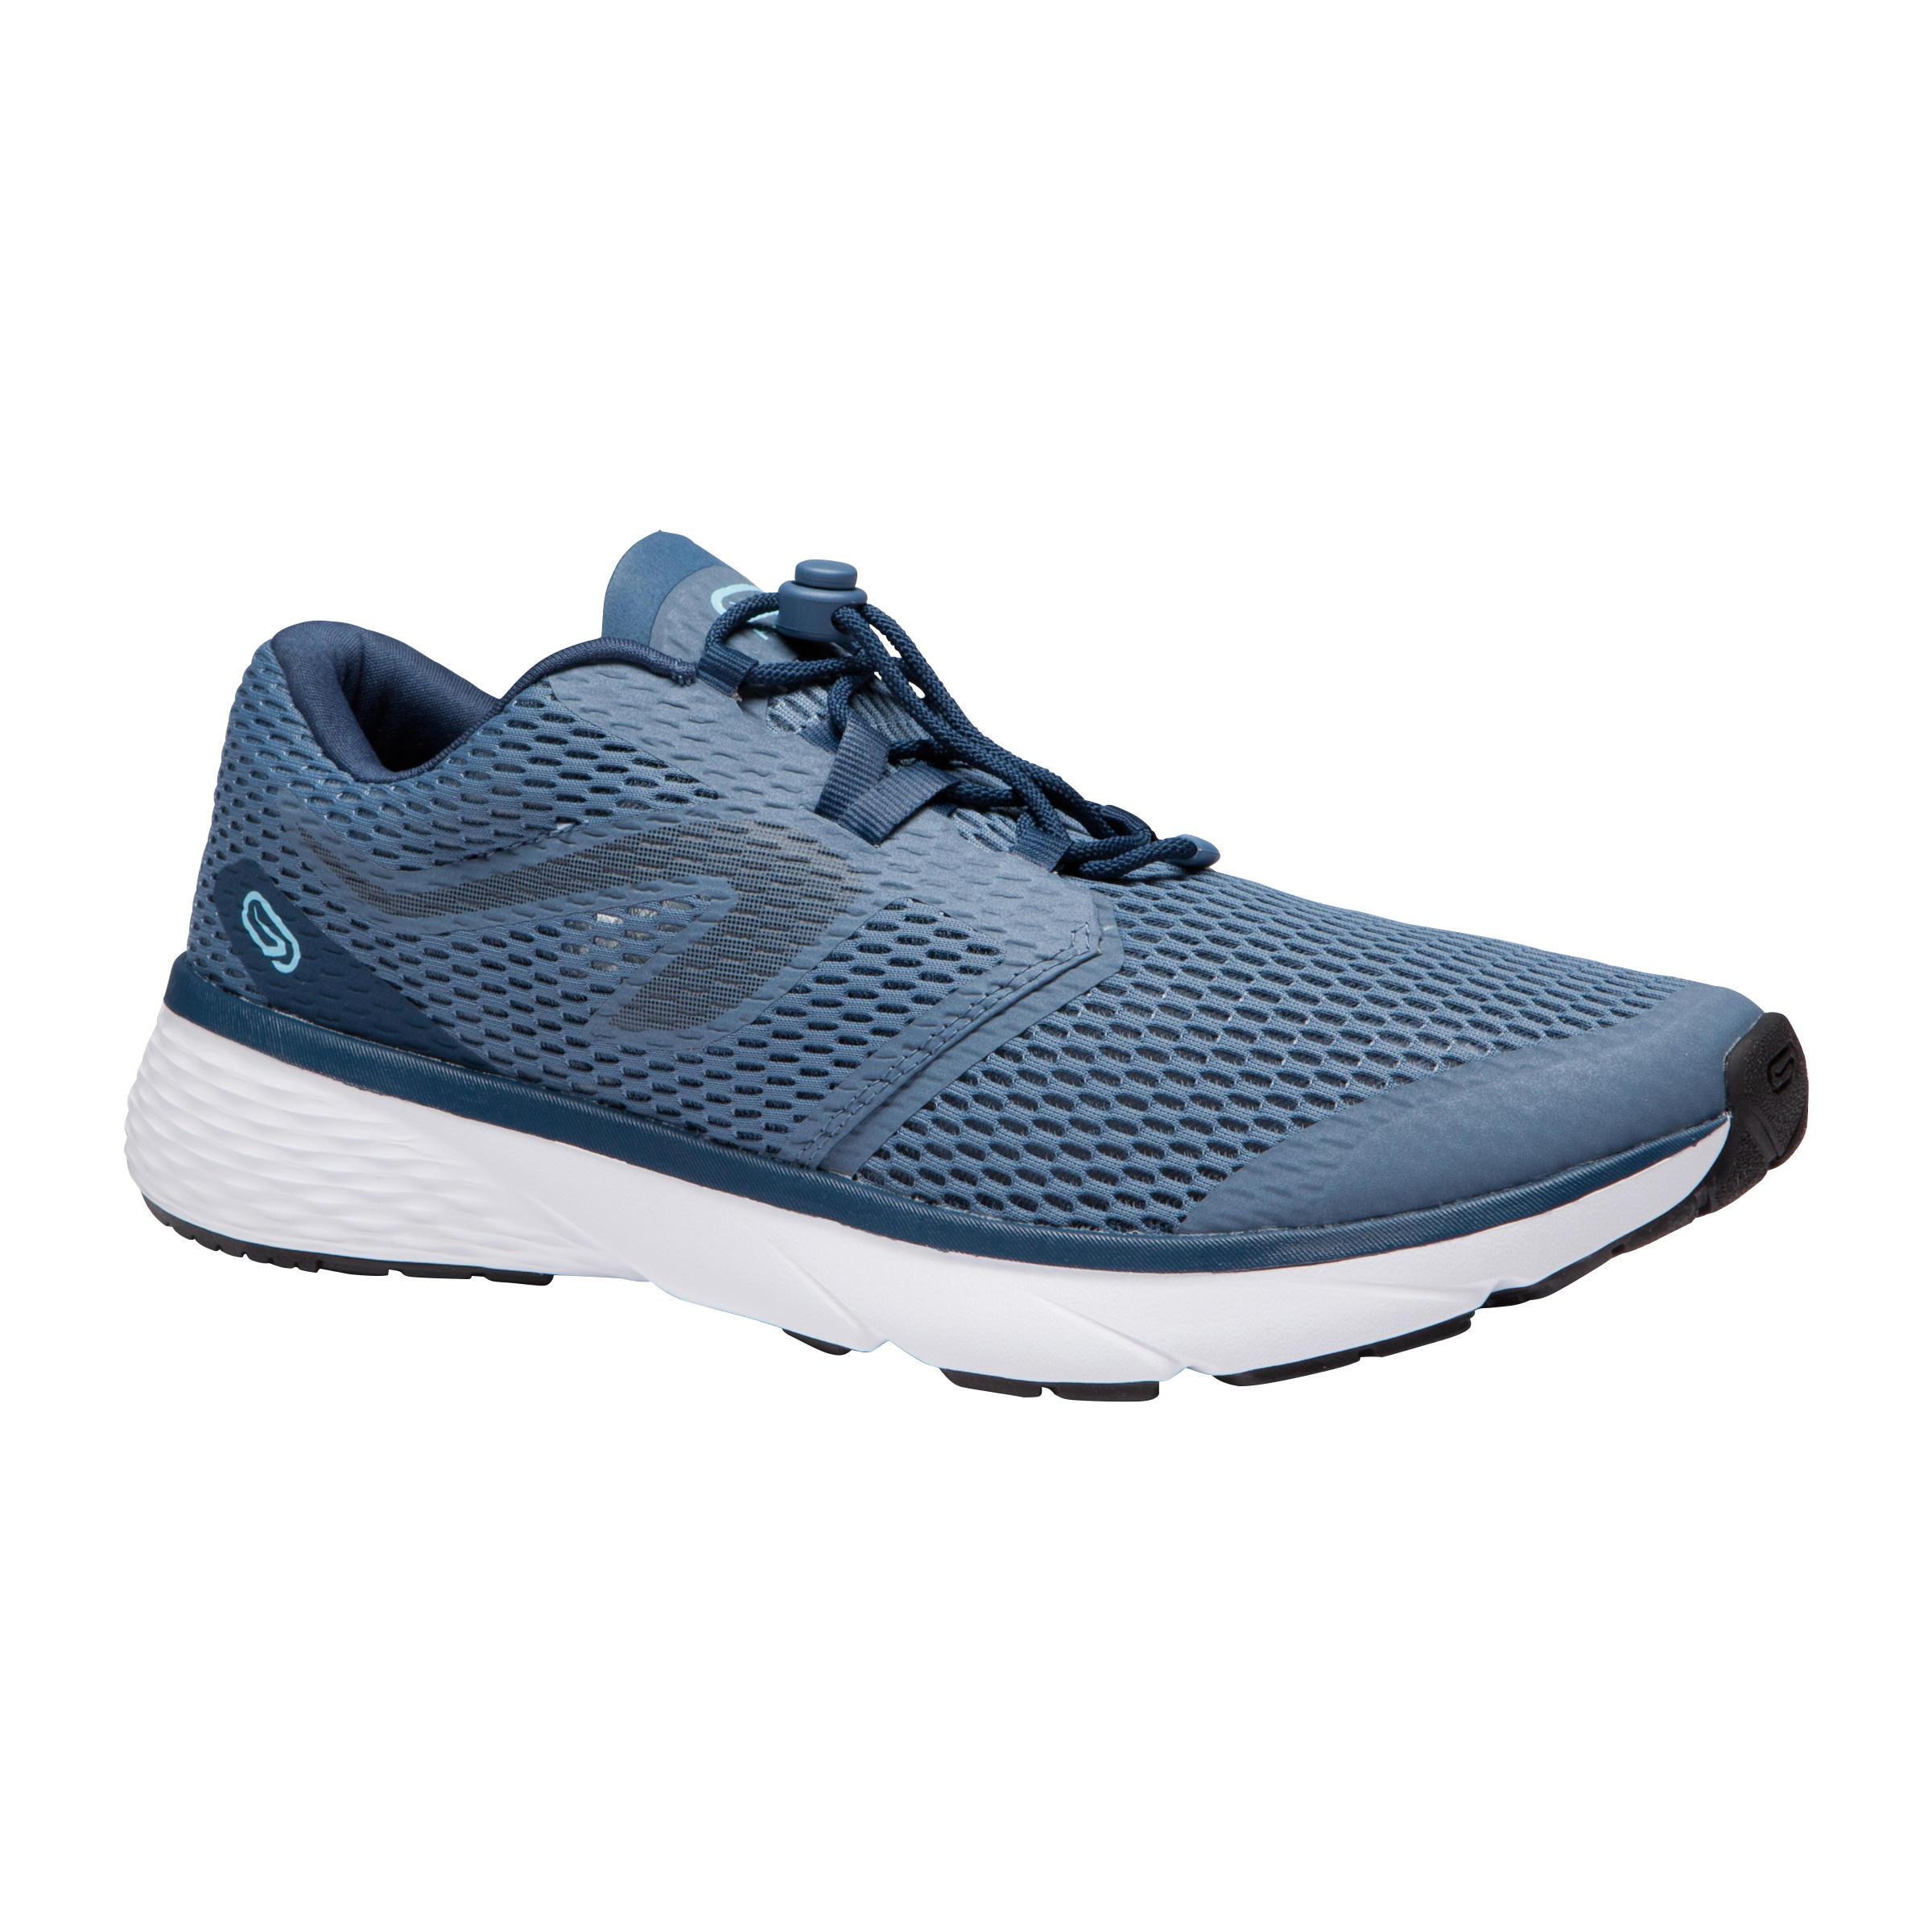 d444c5bc18326 Comprar zapatillas de running para correr hombre